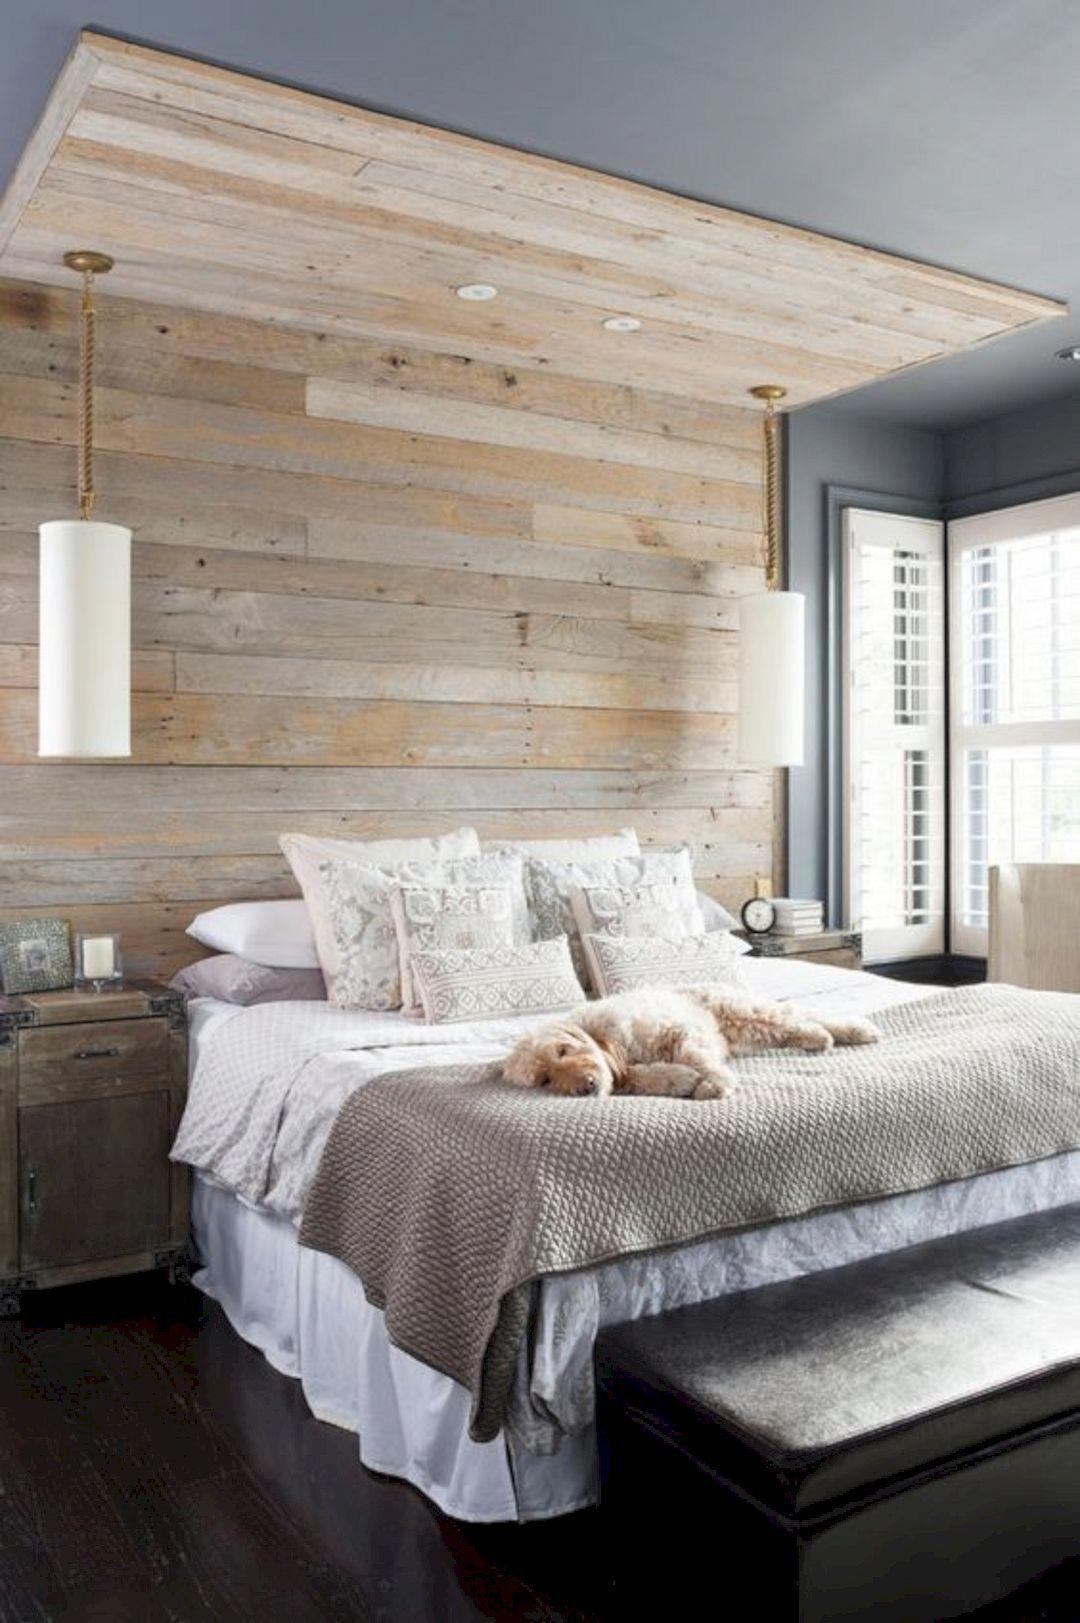 amazing bedroom designs. 17 Amazing Wood Bedroom Designs Https://www.designlisticle.com/wood Amazing Bedroom Designs N